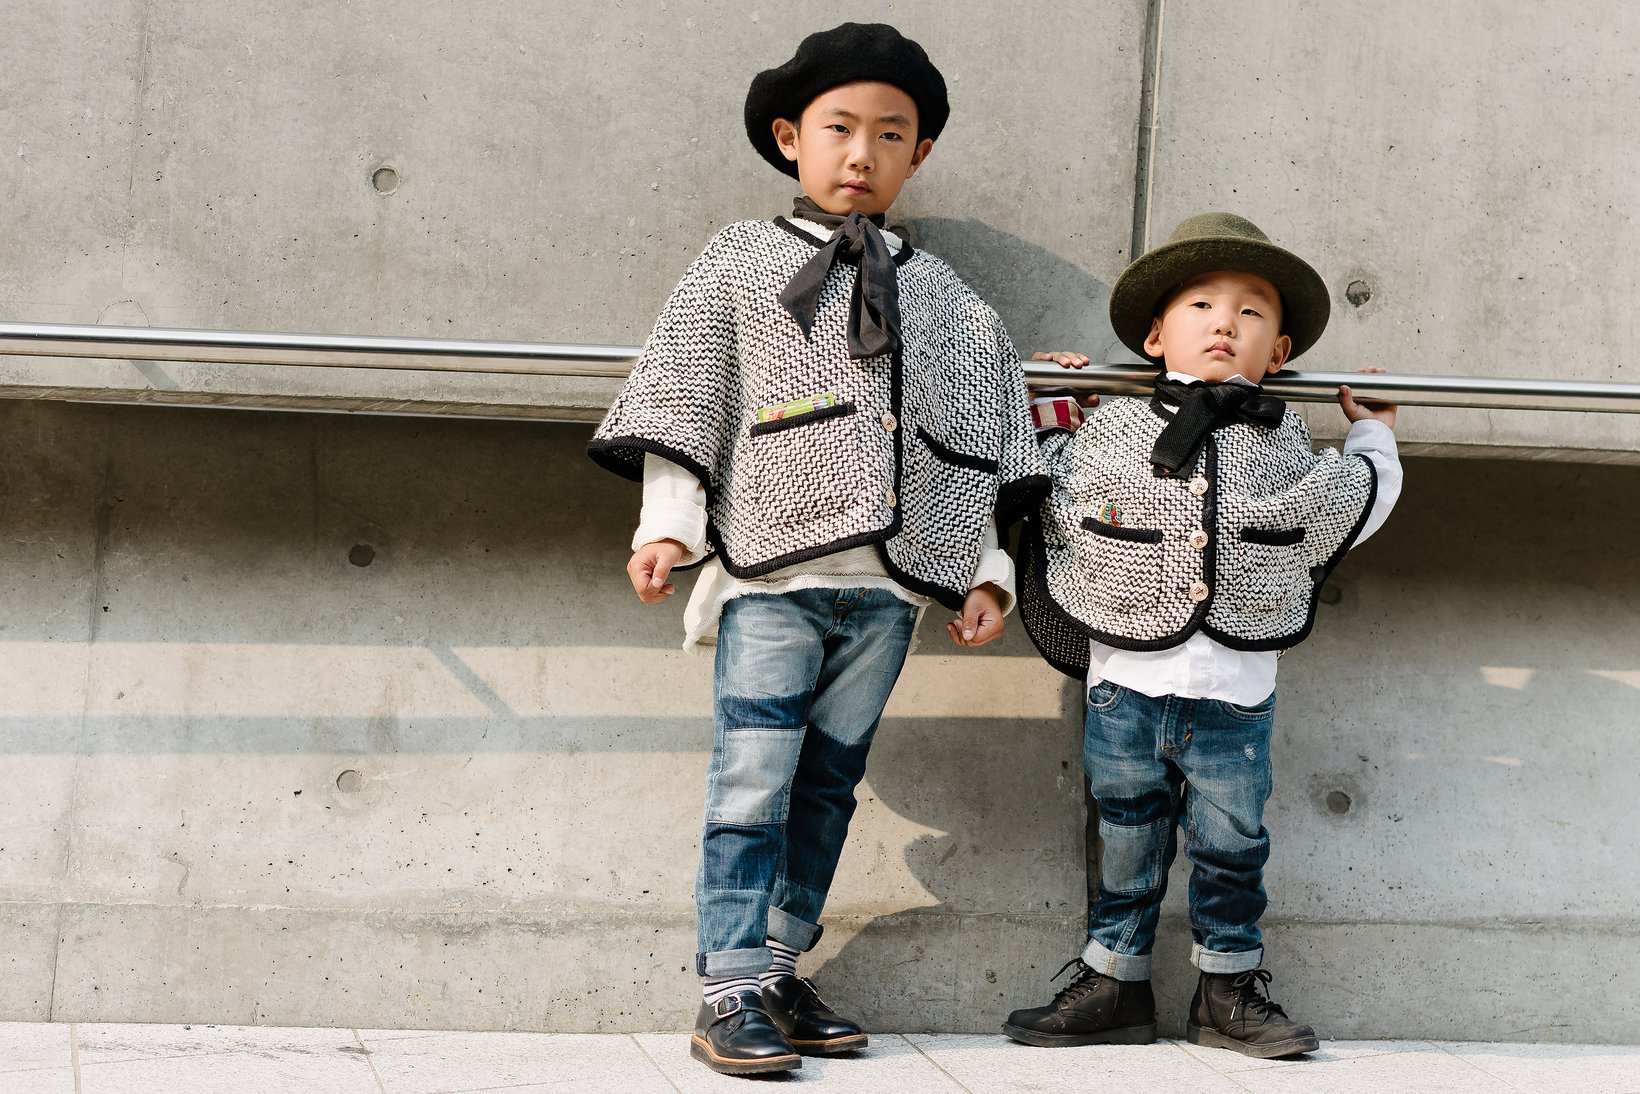 seoul-fashion-week-babies-street-style-05